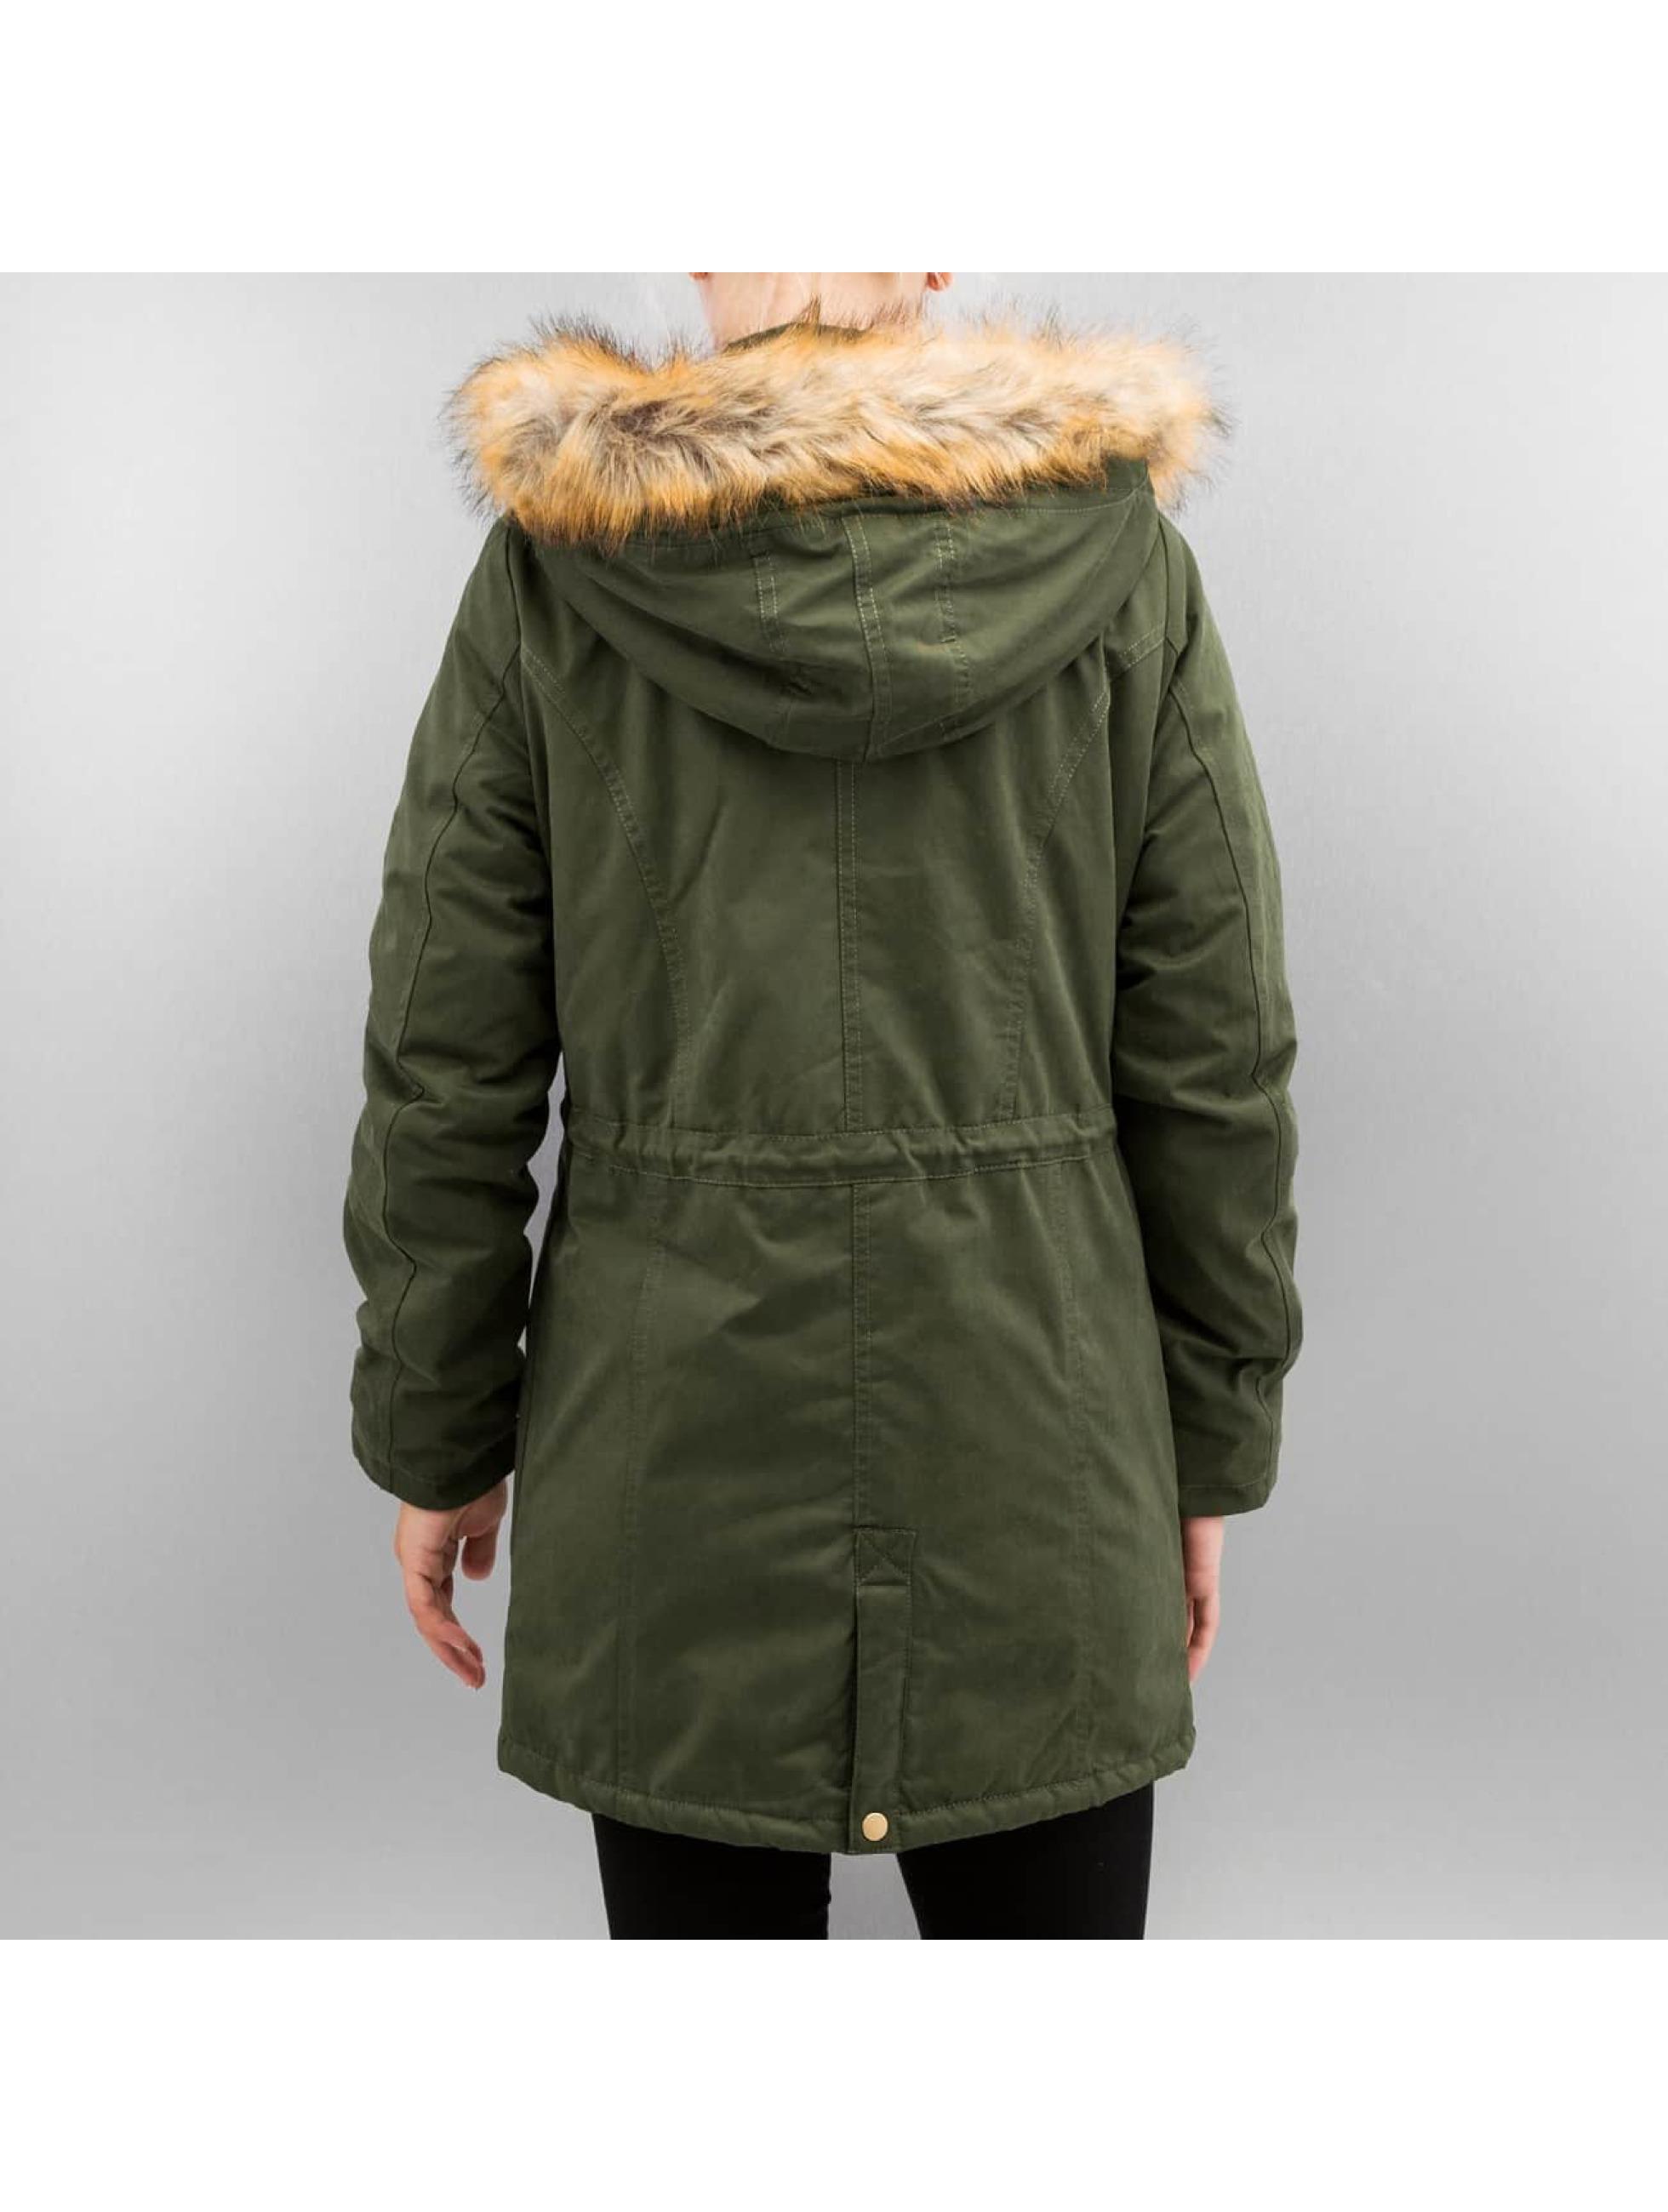 Urban Classics Зимняя куртка Ladies Sherpa Lined Peached оливковый